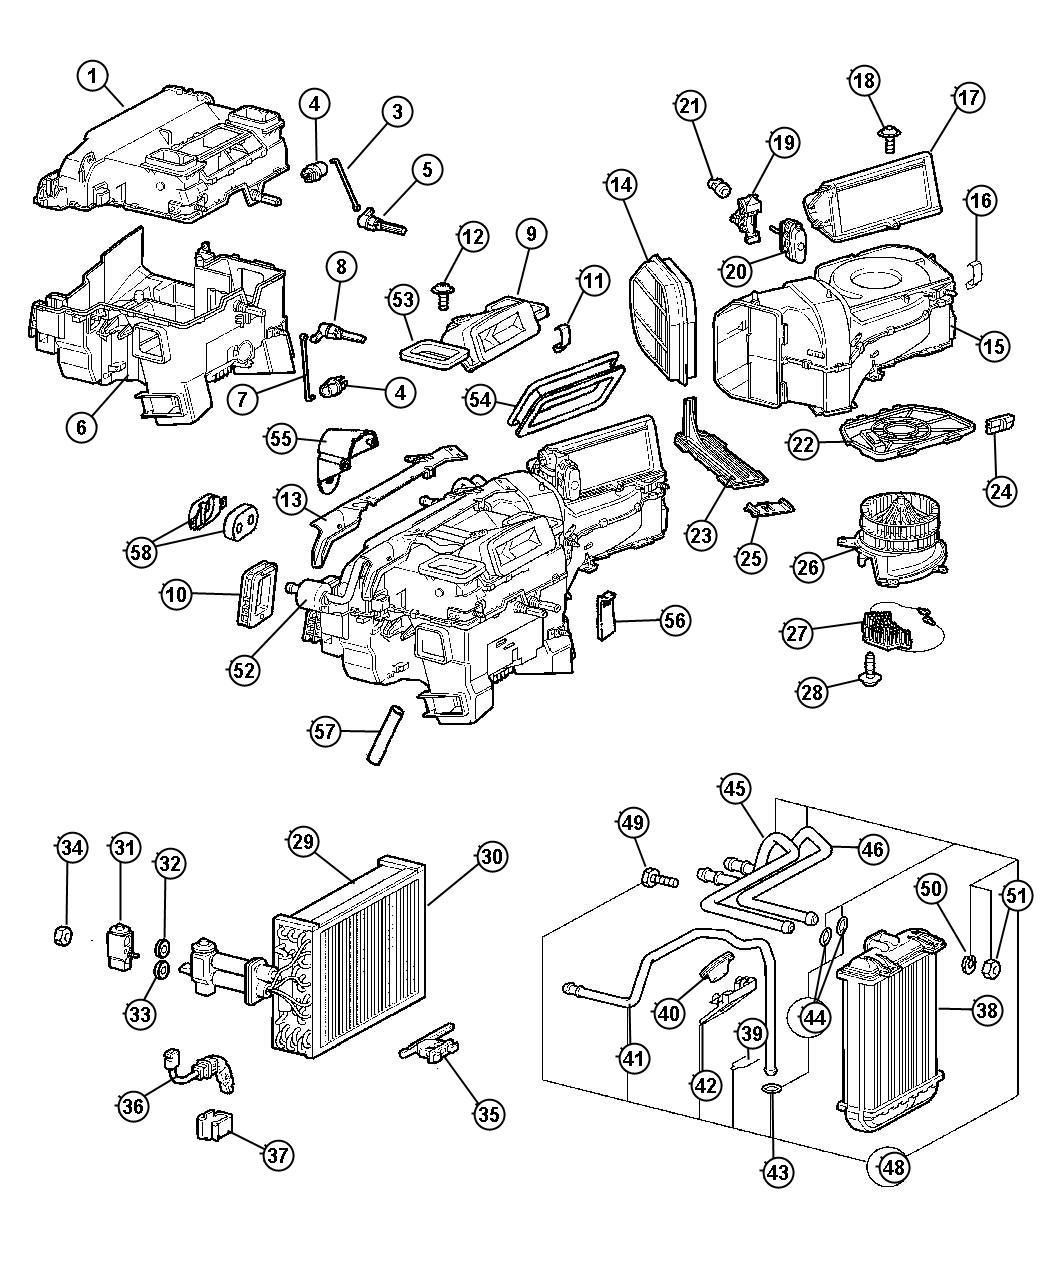 Mercedes C240 Engine Fuse Box Diagram Mercedes Auto